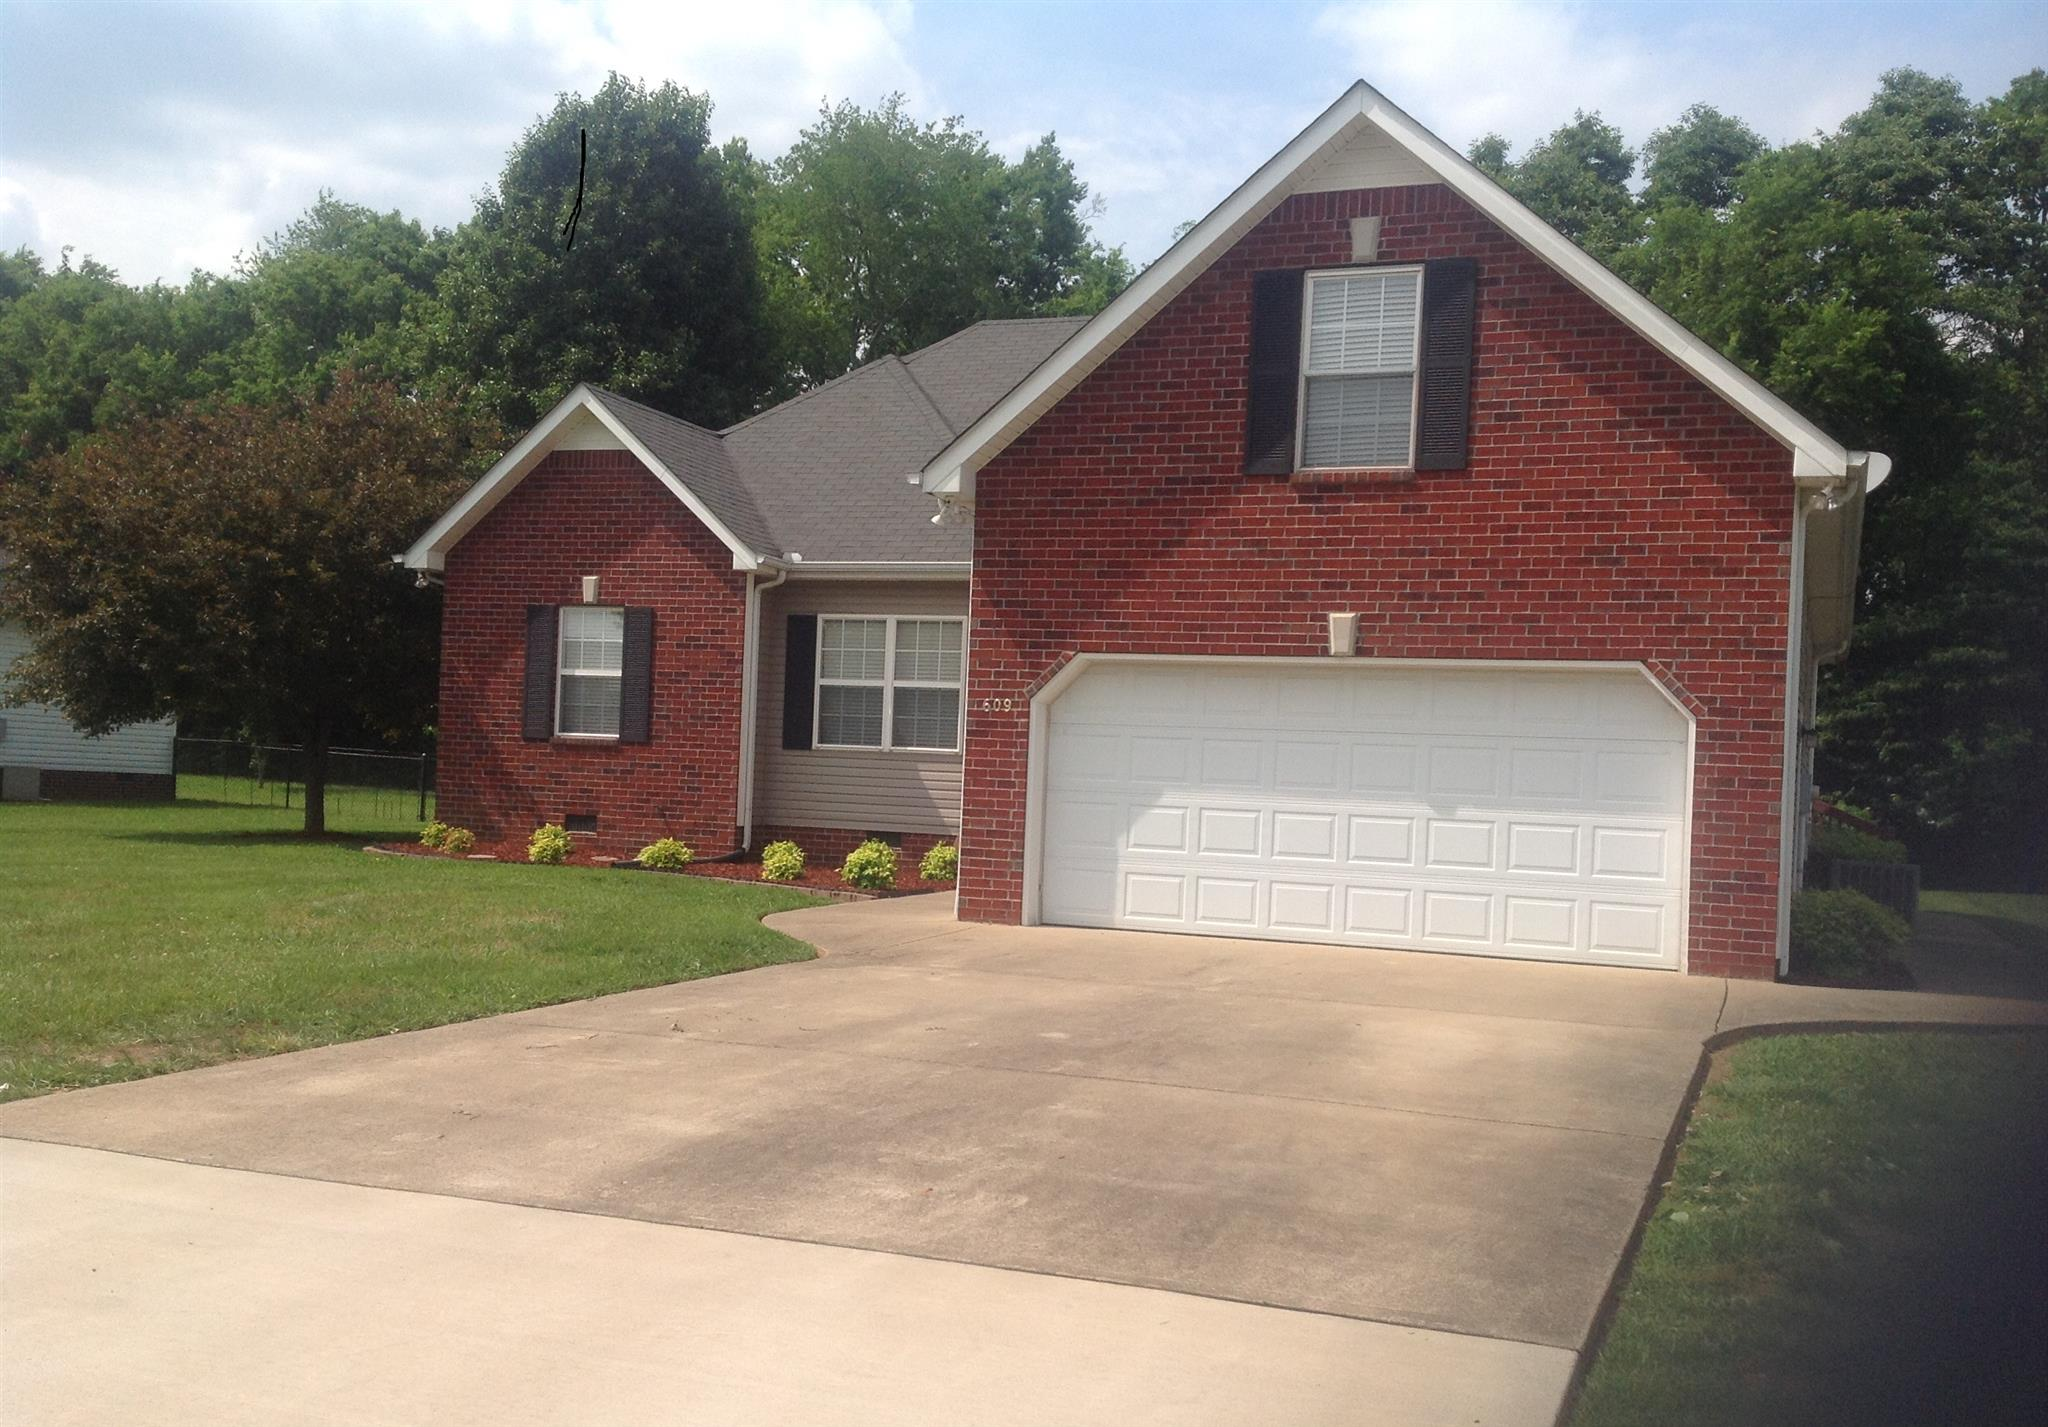 609 Joe B Jackson Pkwy, Murfreesboro, TN 37127